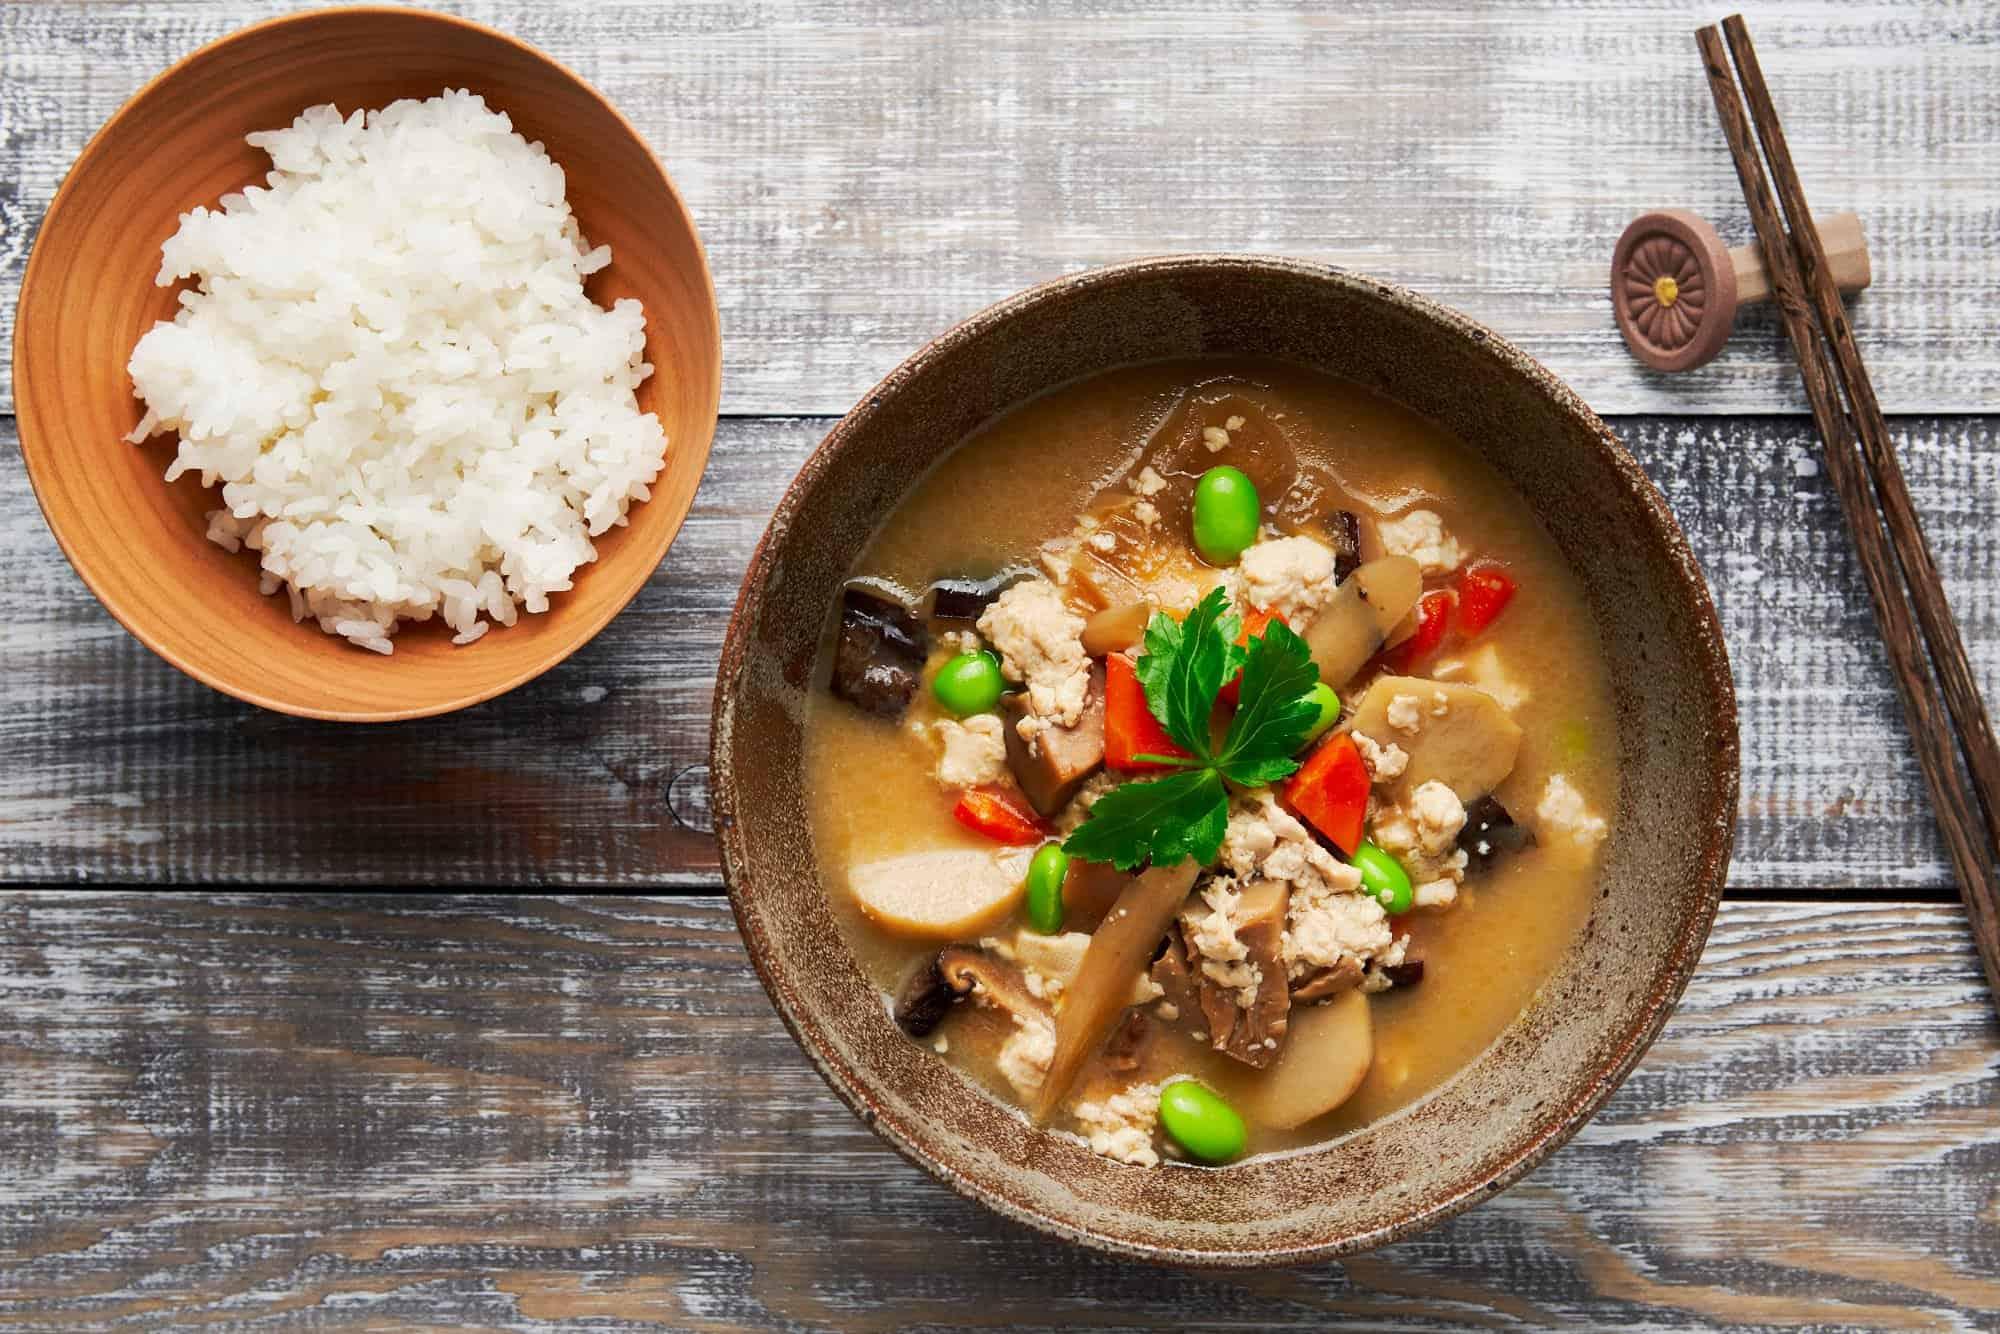 Kenchinjiru is a plant-based Japanese soup made with vegan dashi and loaded with carrots, tofu, edamame, shiitake, daikon and burdock.